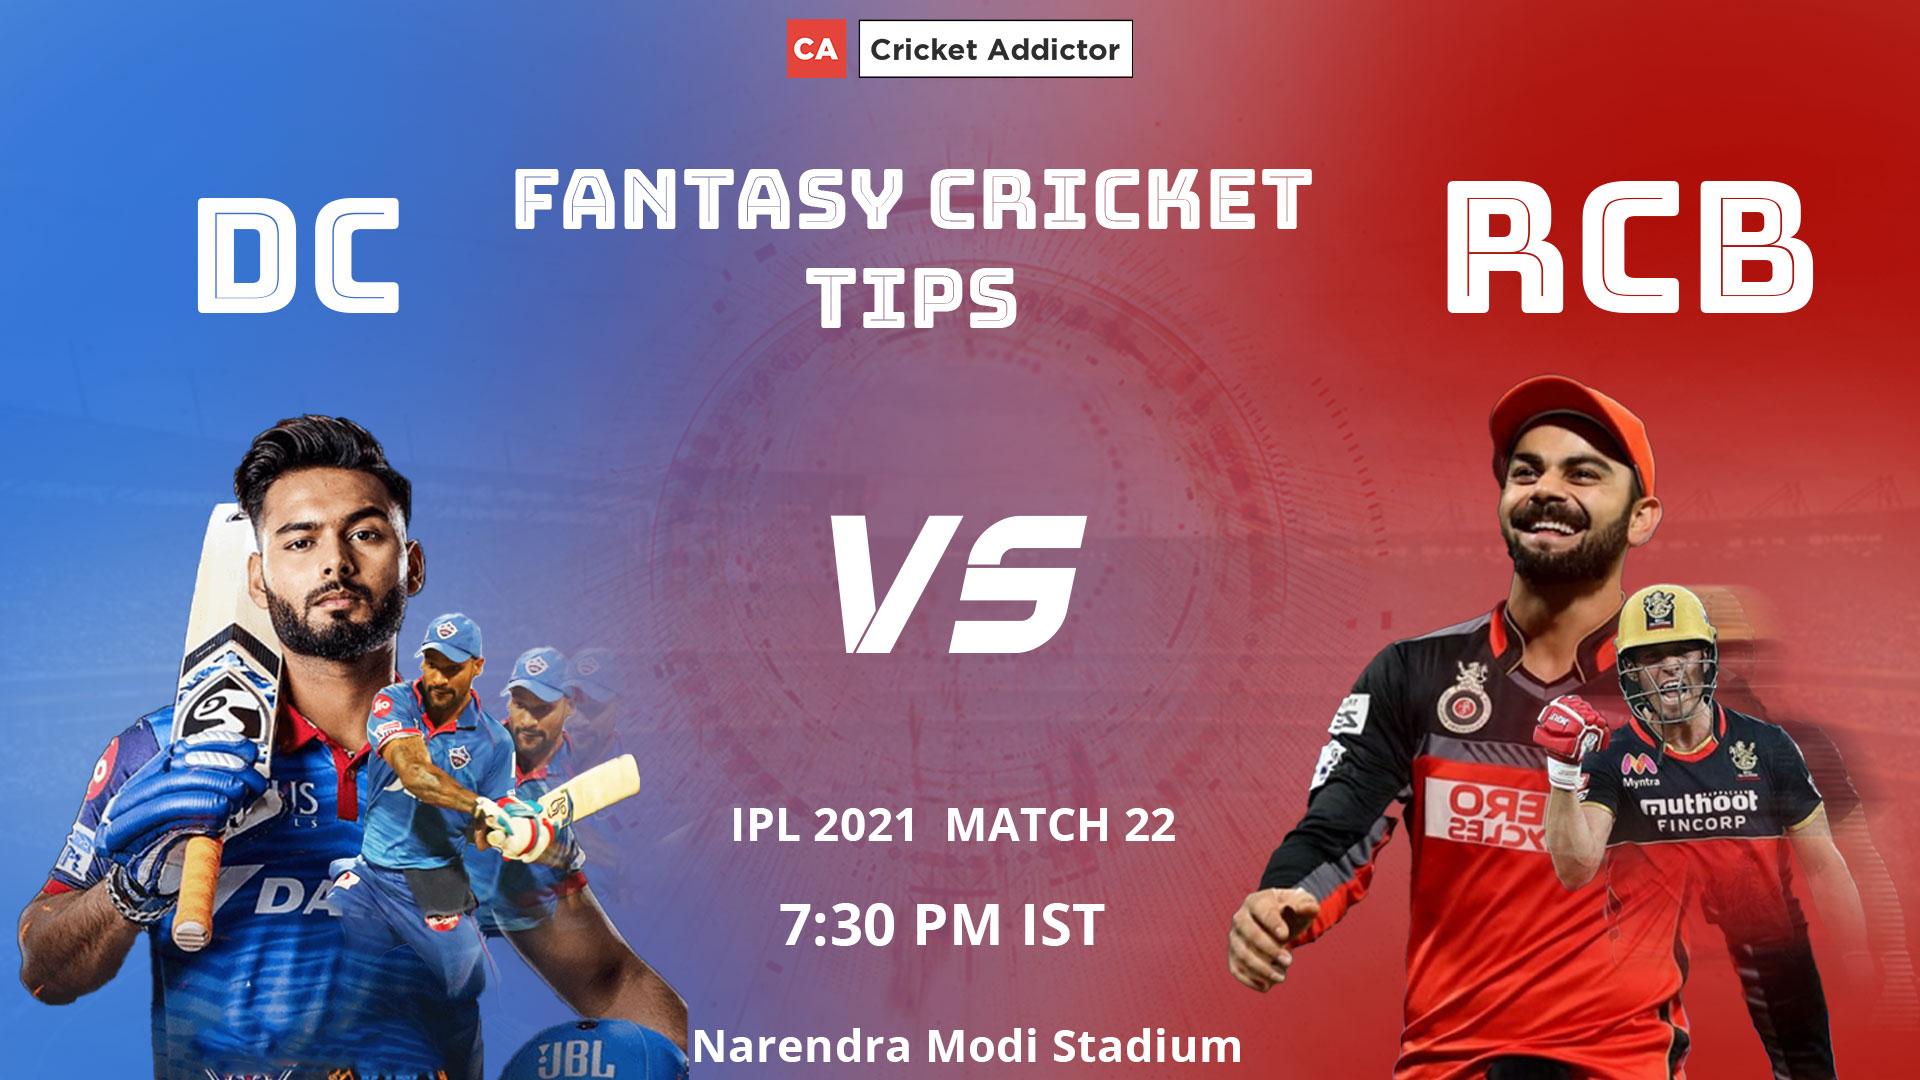 Delhi Capitals (DC) vs Royal Challengers Bangalore (RCB) Dream11 Prediction, Fantasy Cricket Tips, Playing XI, Pitch Report, Dream11 Team, Injury Update of VIVO IPL 2021.